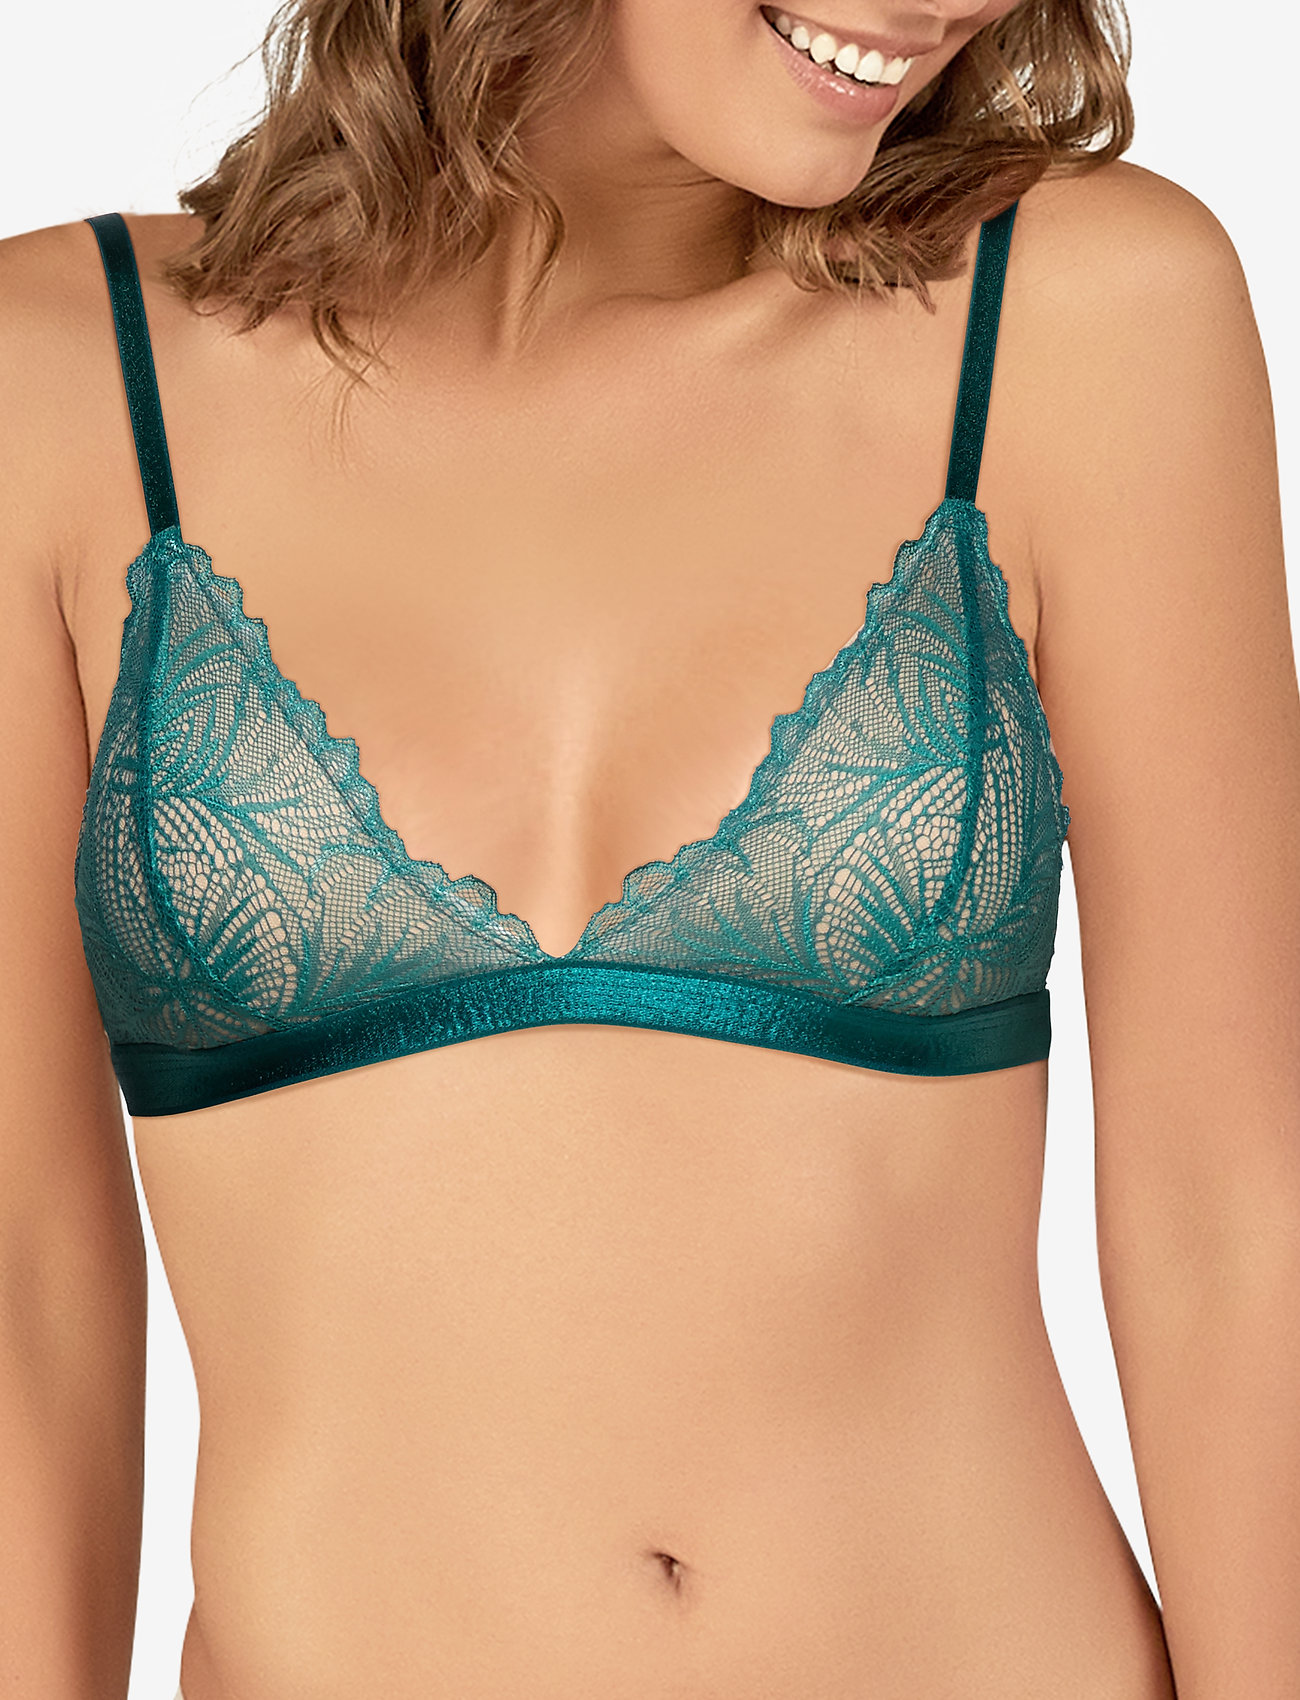 Underprotection lima bra - TURQUISE